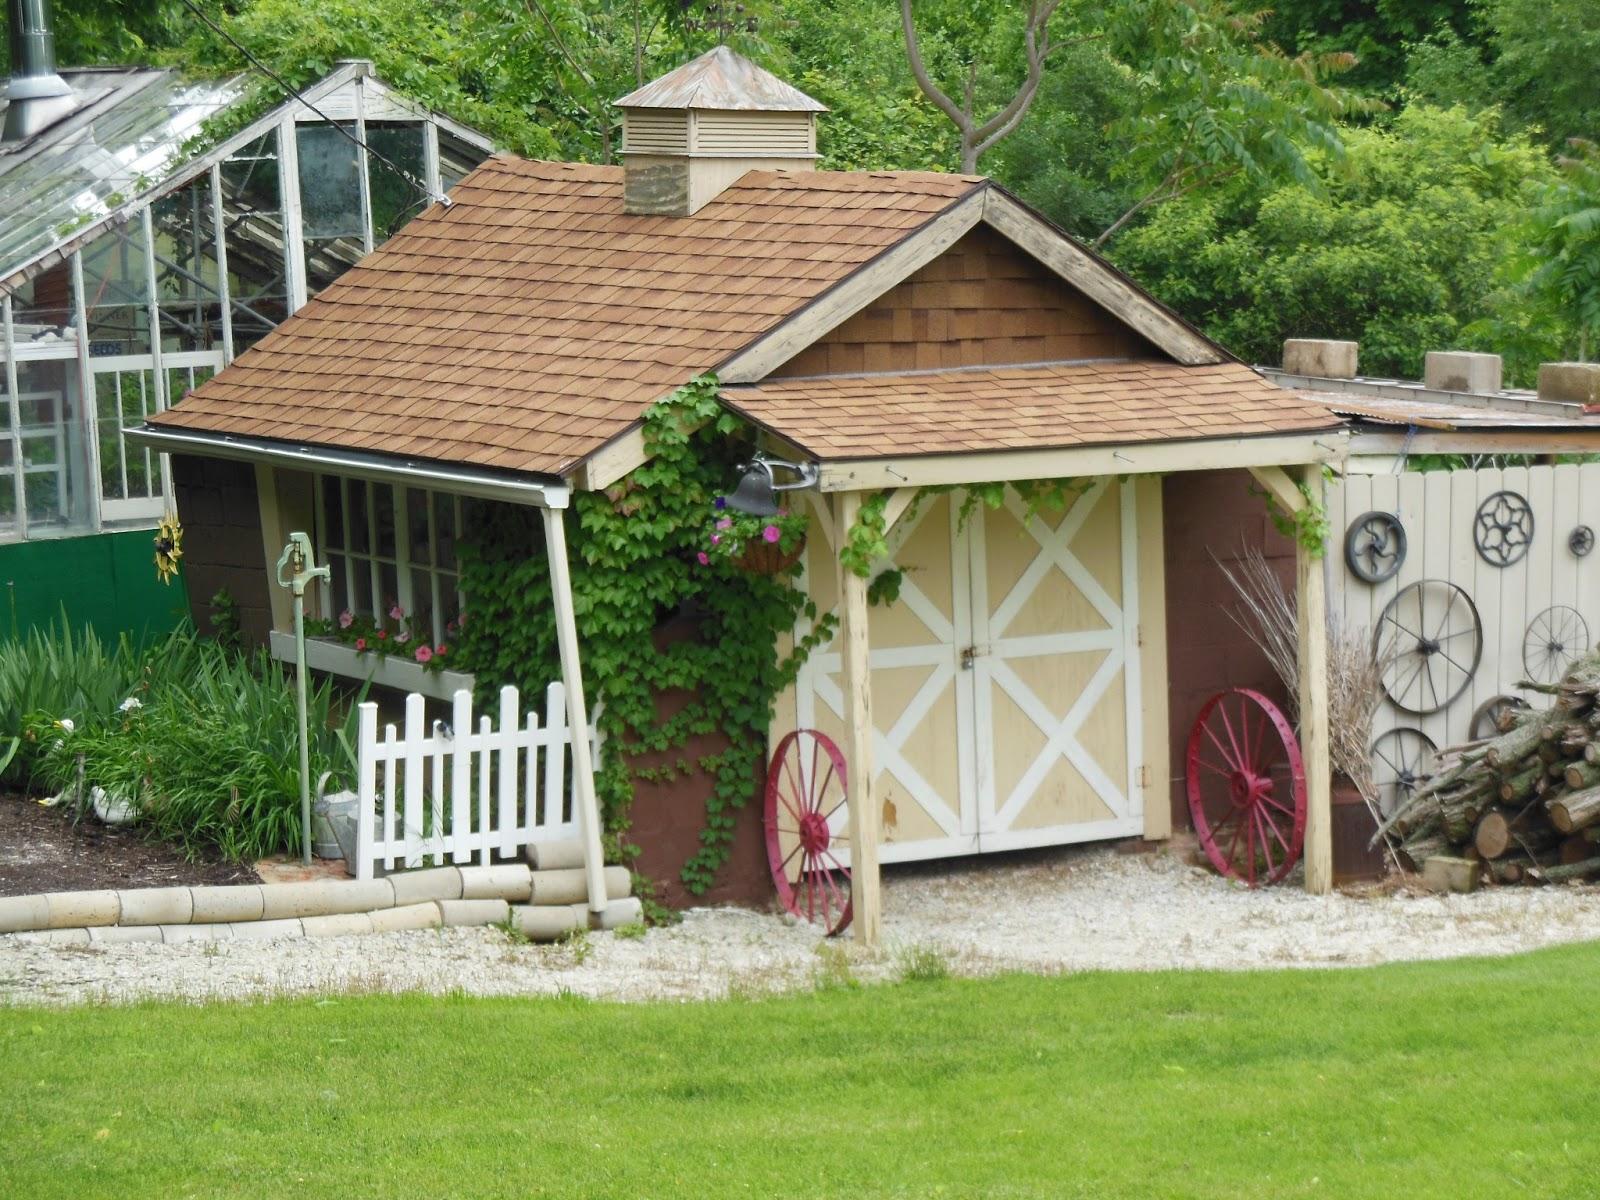 Rustynailgarden Cute Little Garden Sheds